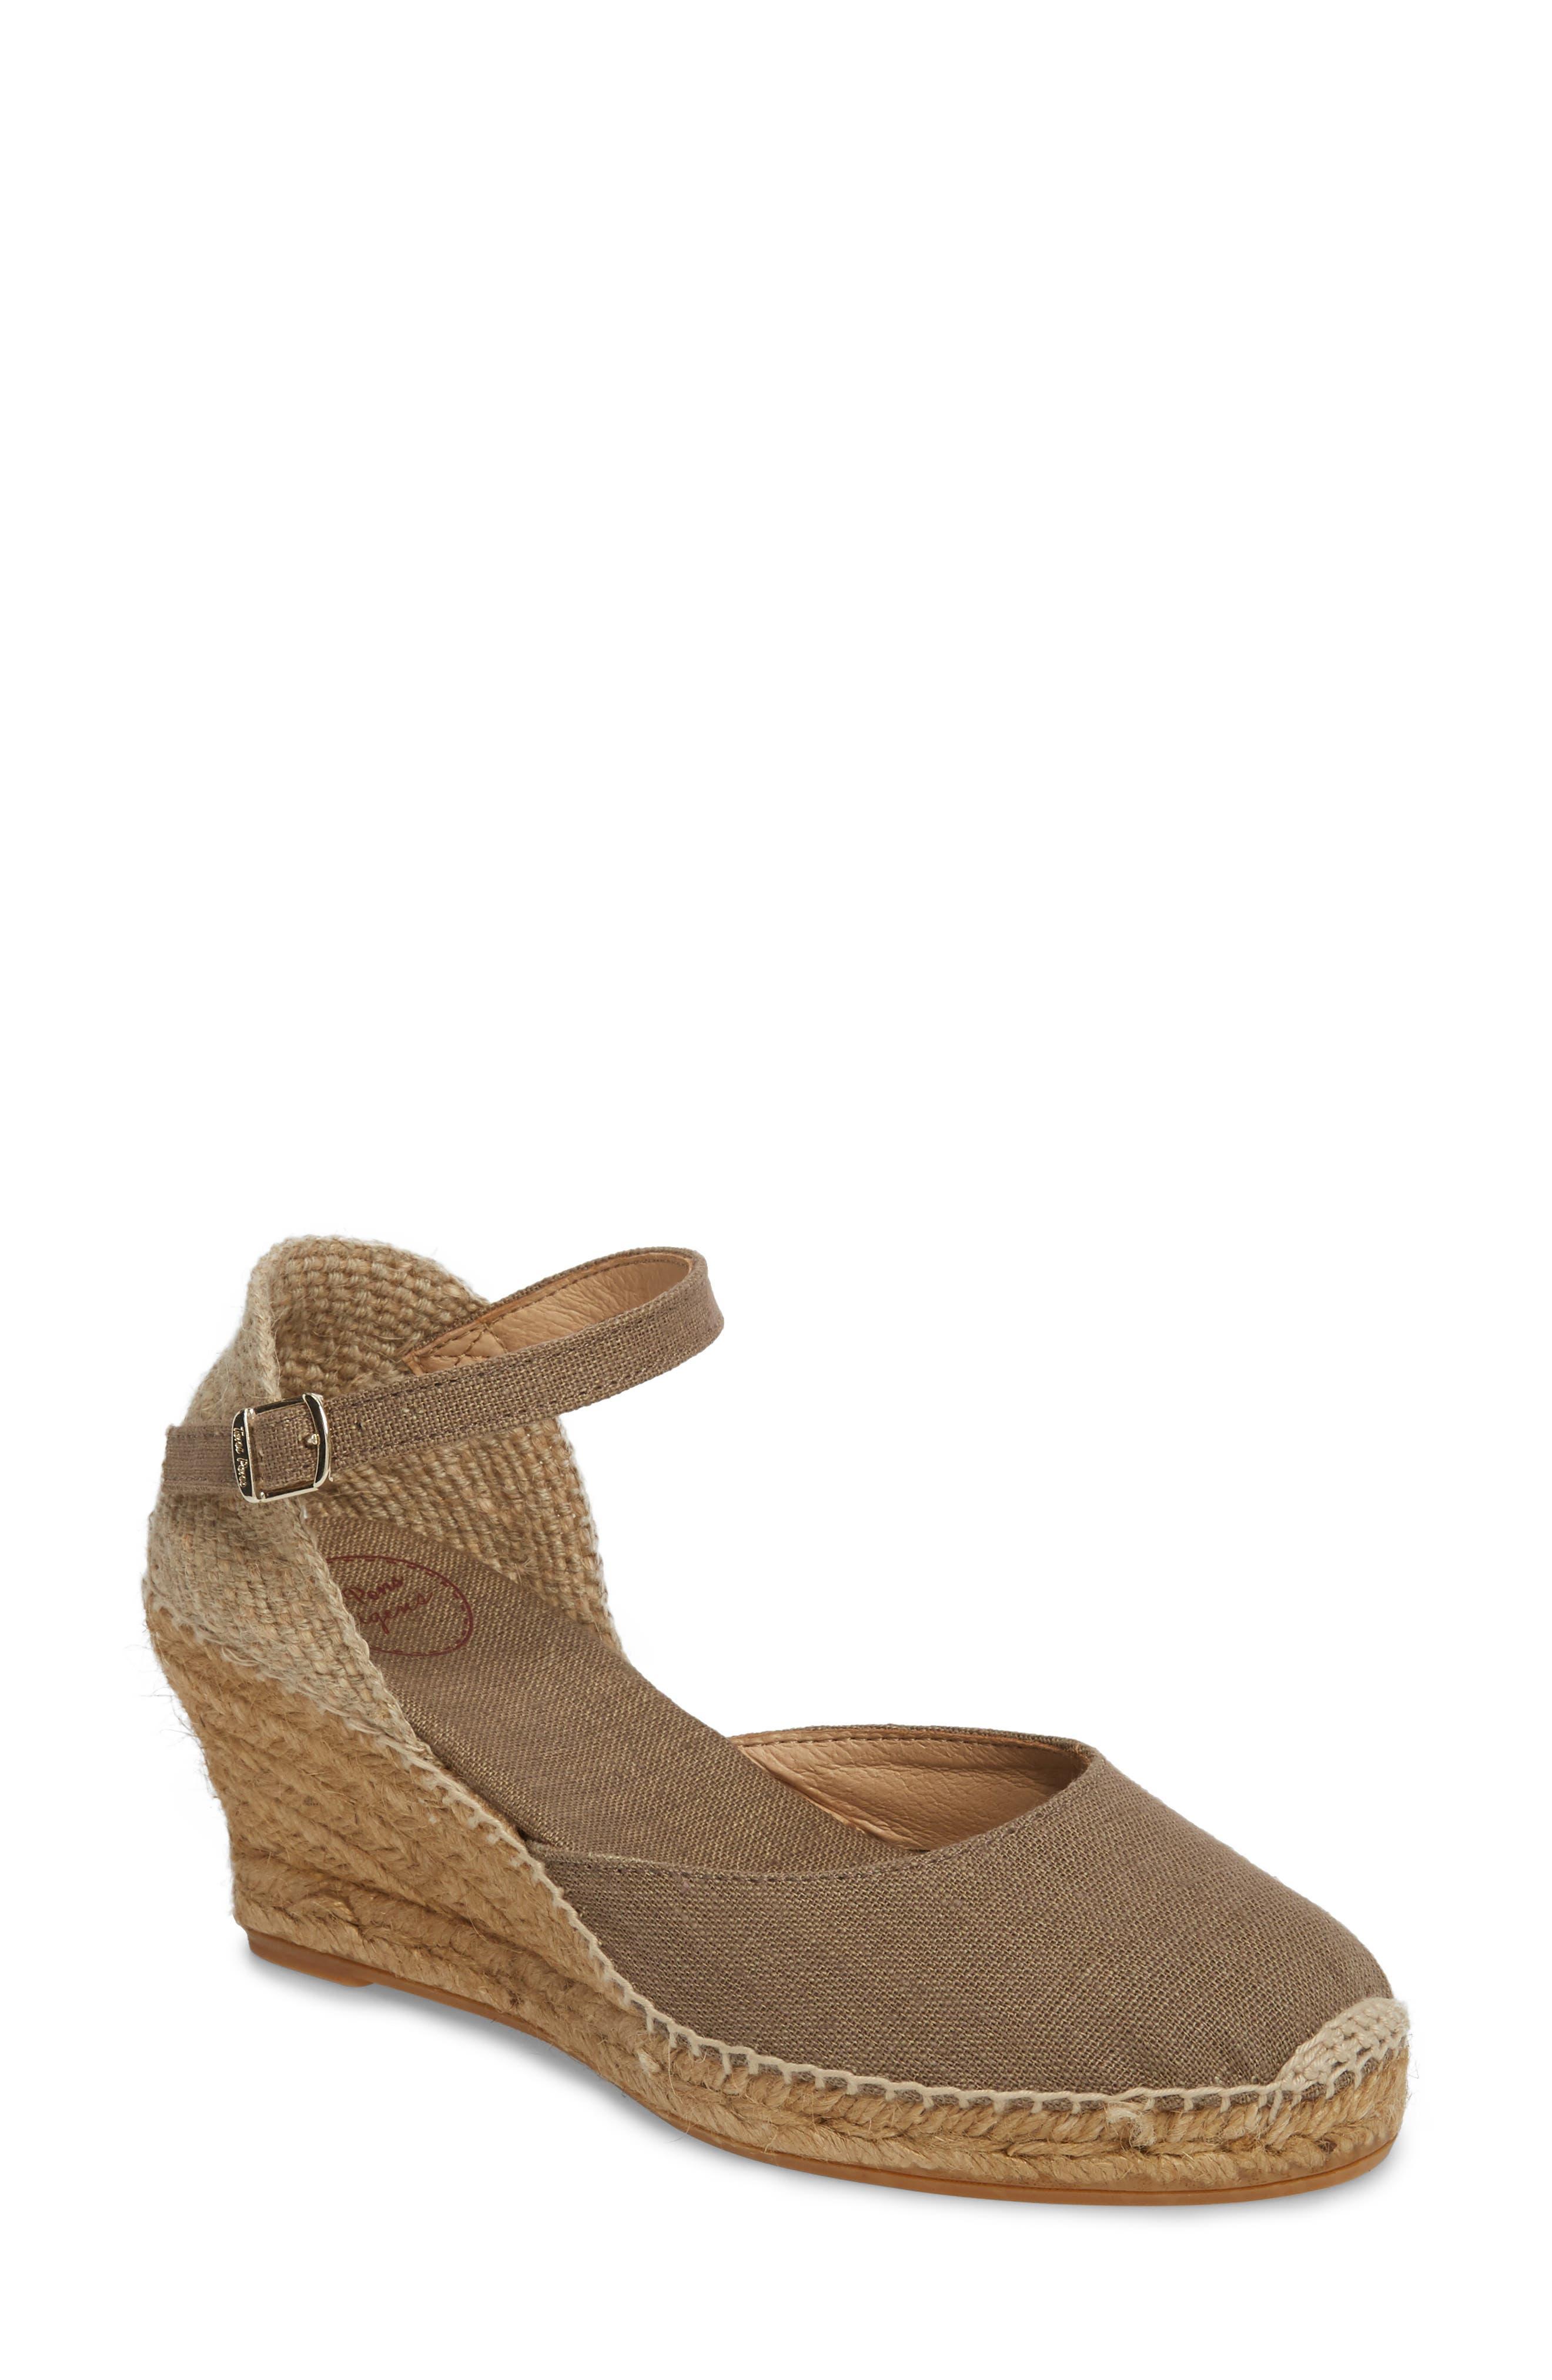 'Caldes' Linen Wedge Sandal,                             Main thumbnail 1, color,                             TAUPE FABRIC